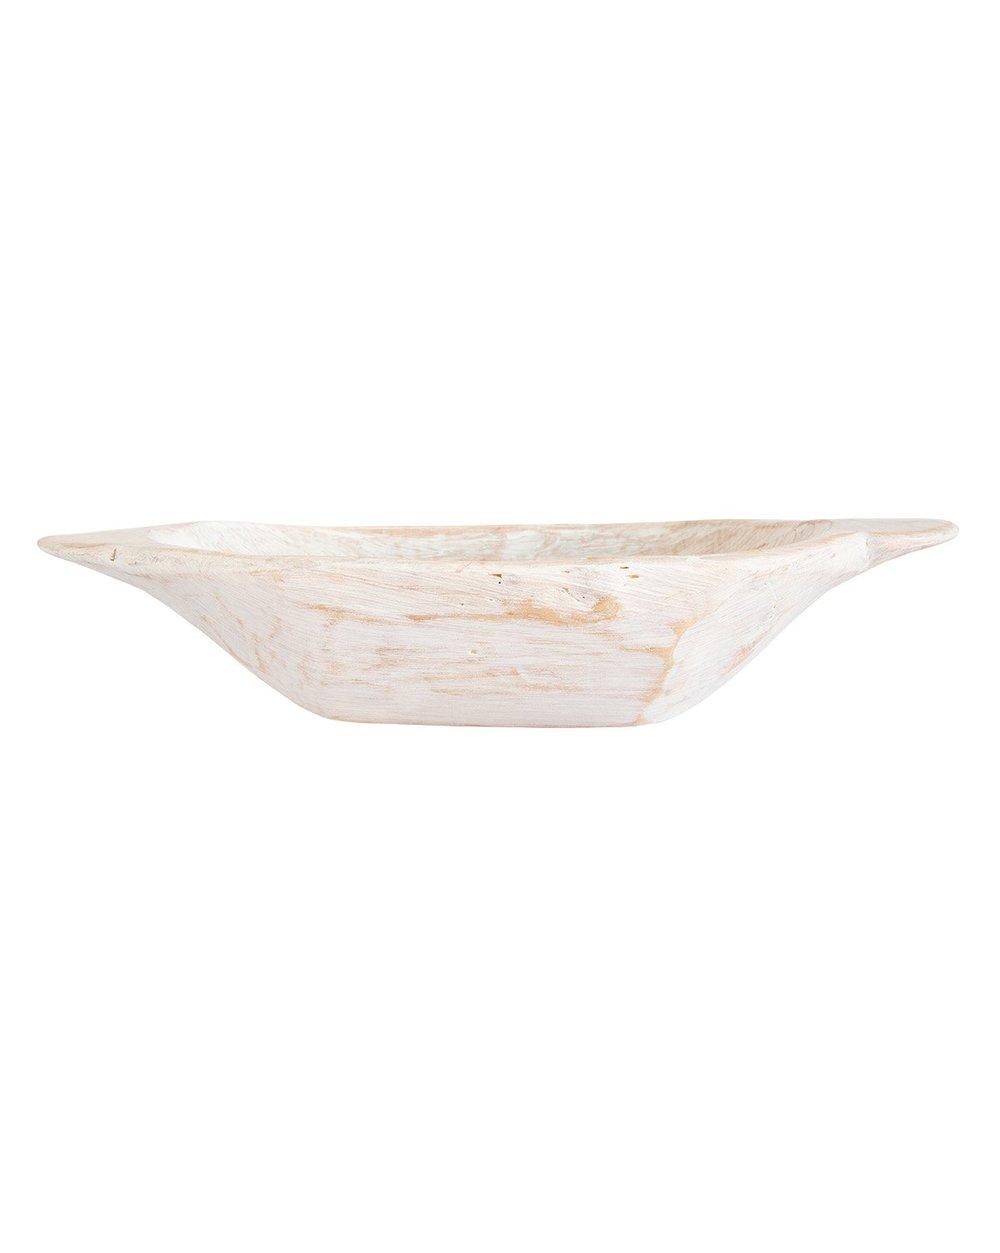 Distressed_White_Bread_Bowl_1.jpg